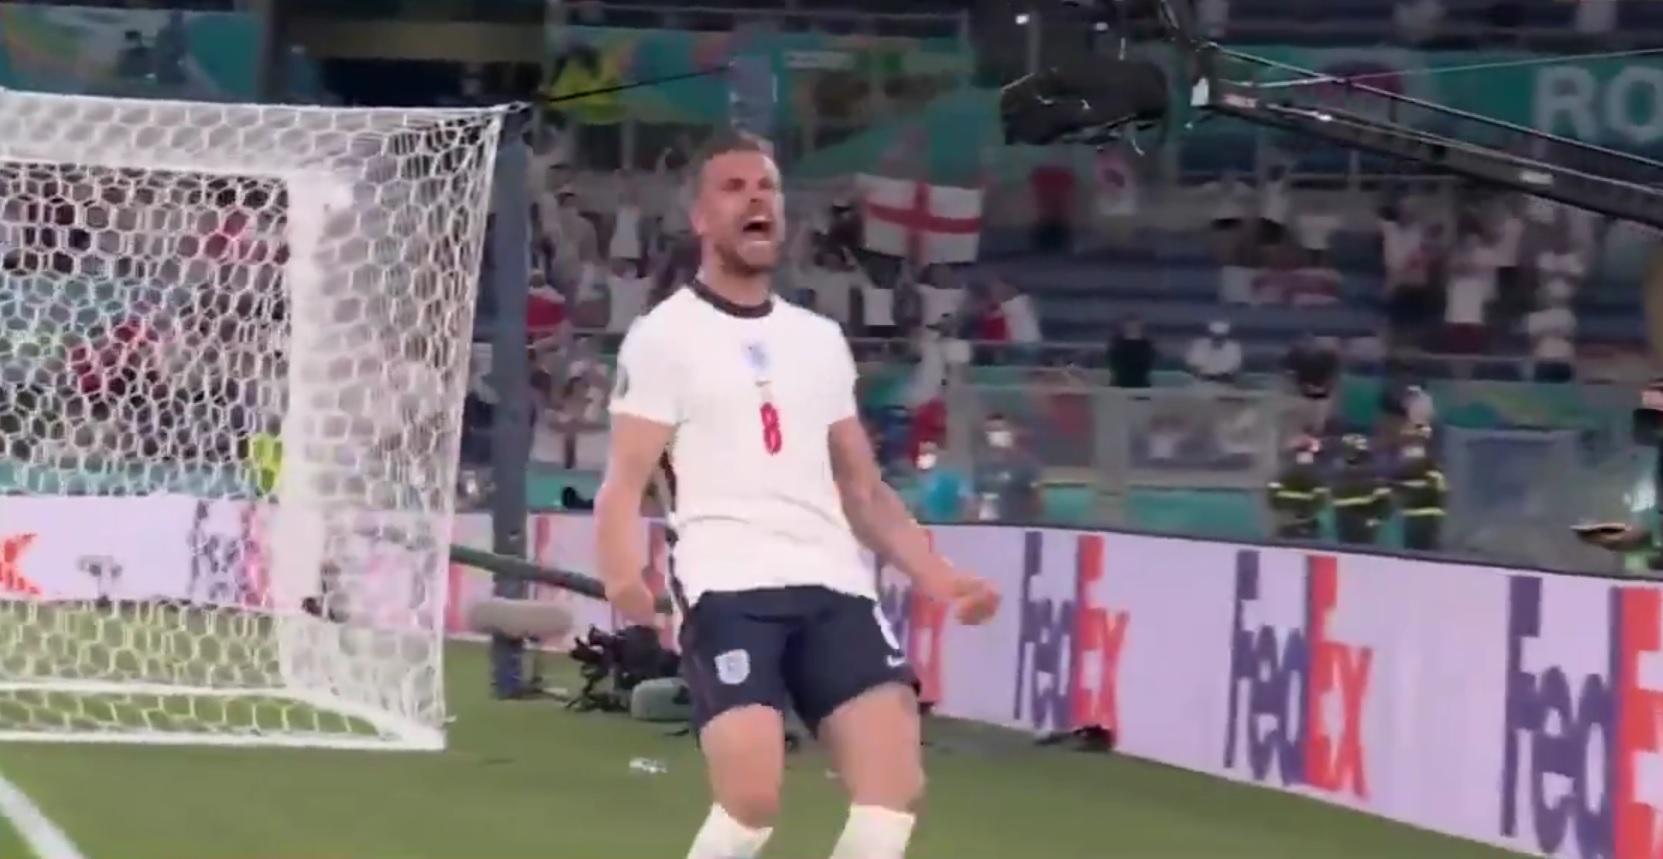 (Video) Jordan Henderson scores first England goal & drops big passionate celebration